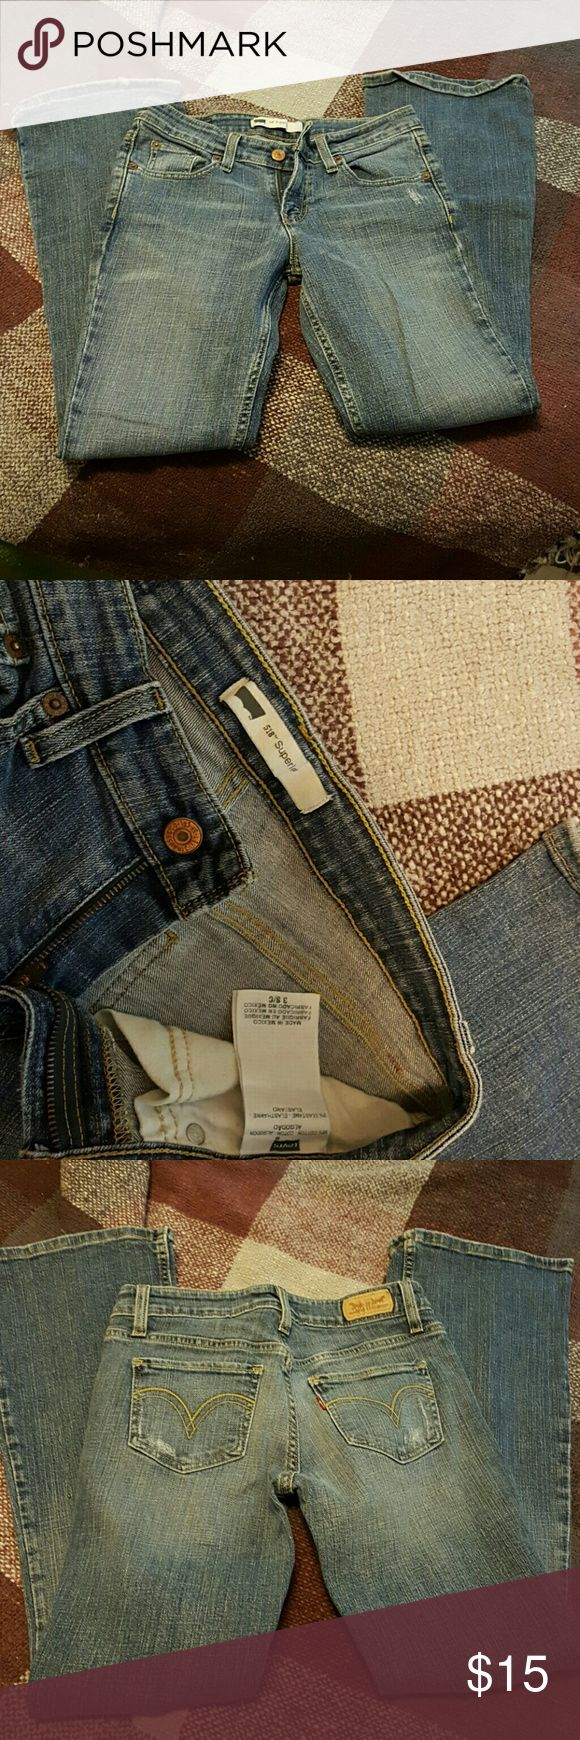 Levi's 519 Super low jeans Great jeans rarely worn. Levi's  Jeans Boot Cut